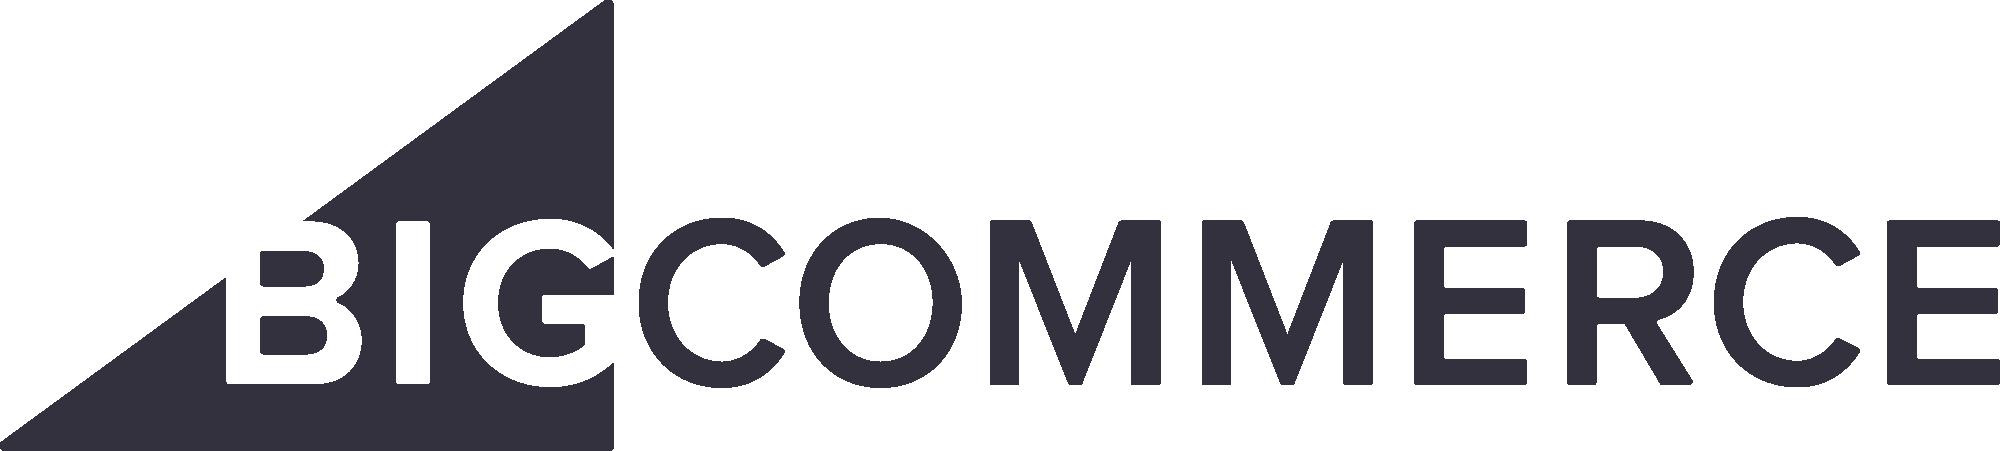 BigCommerce Holdings IPO